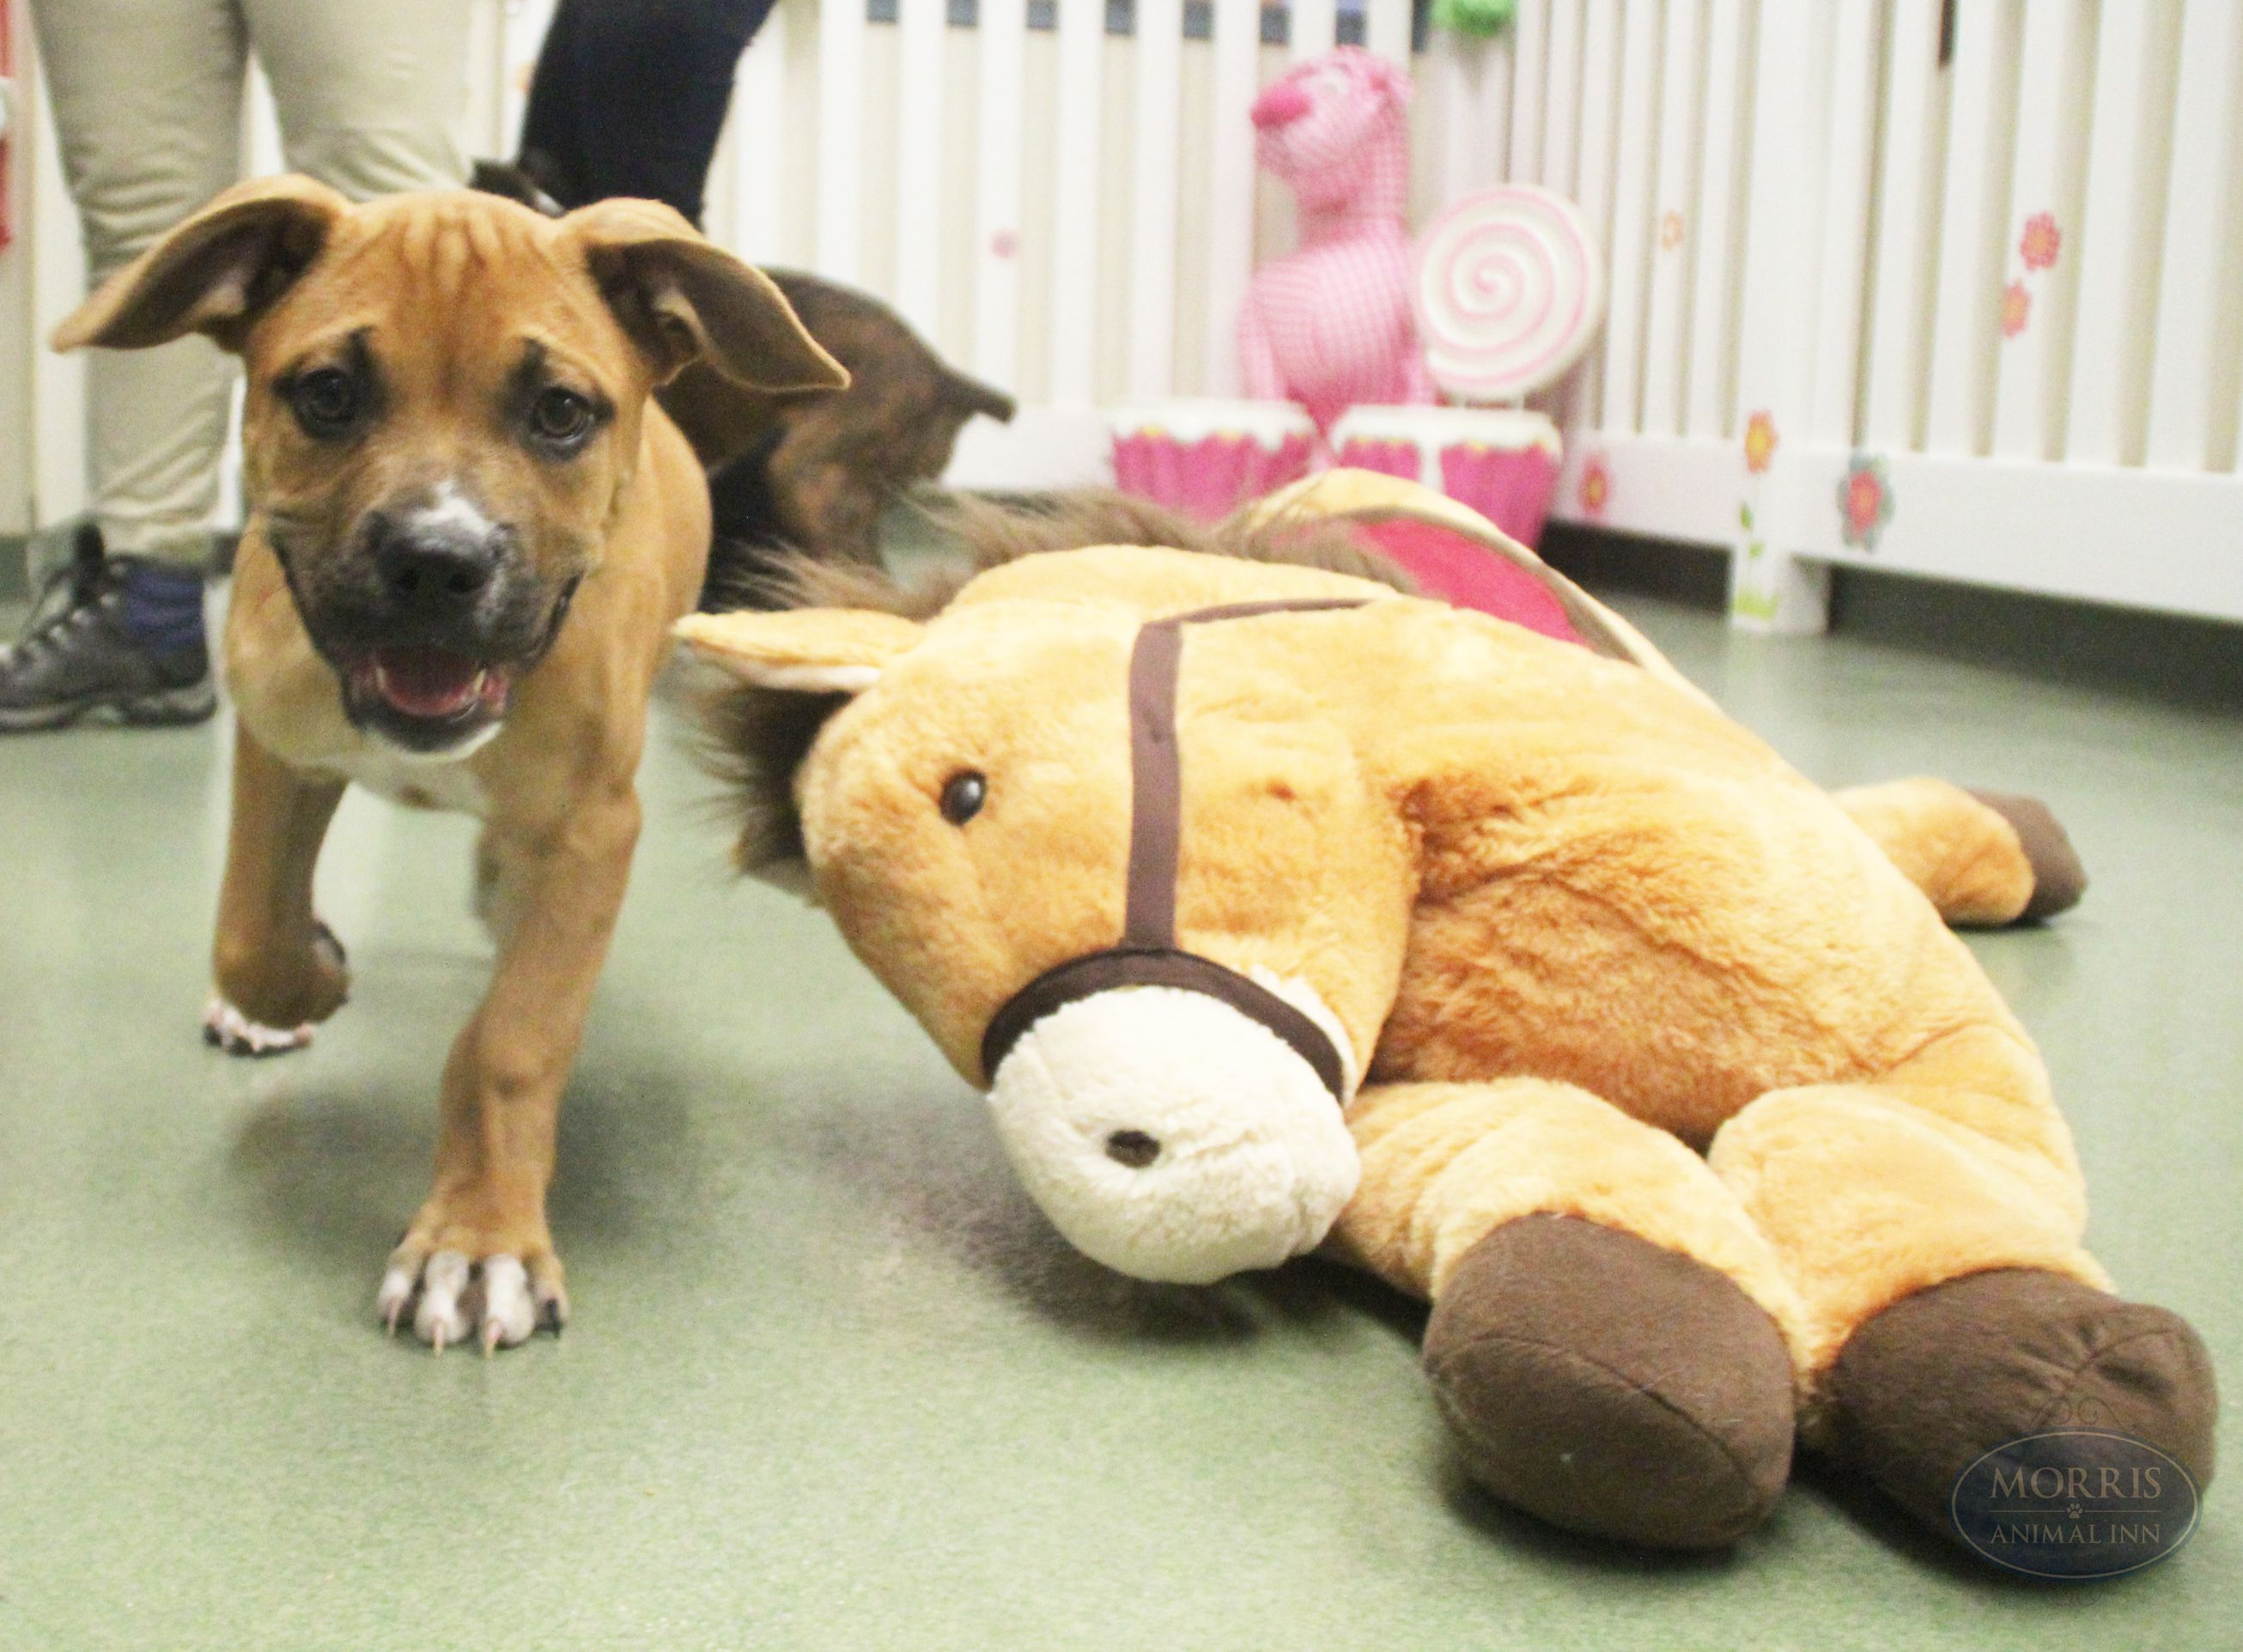 Zeus explores his new environment in the puppy nursery